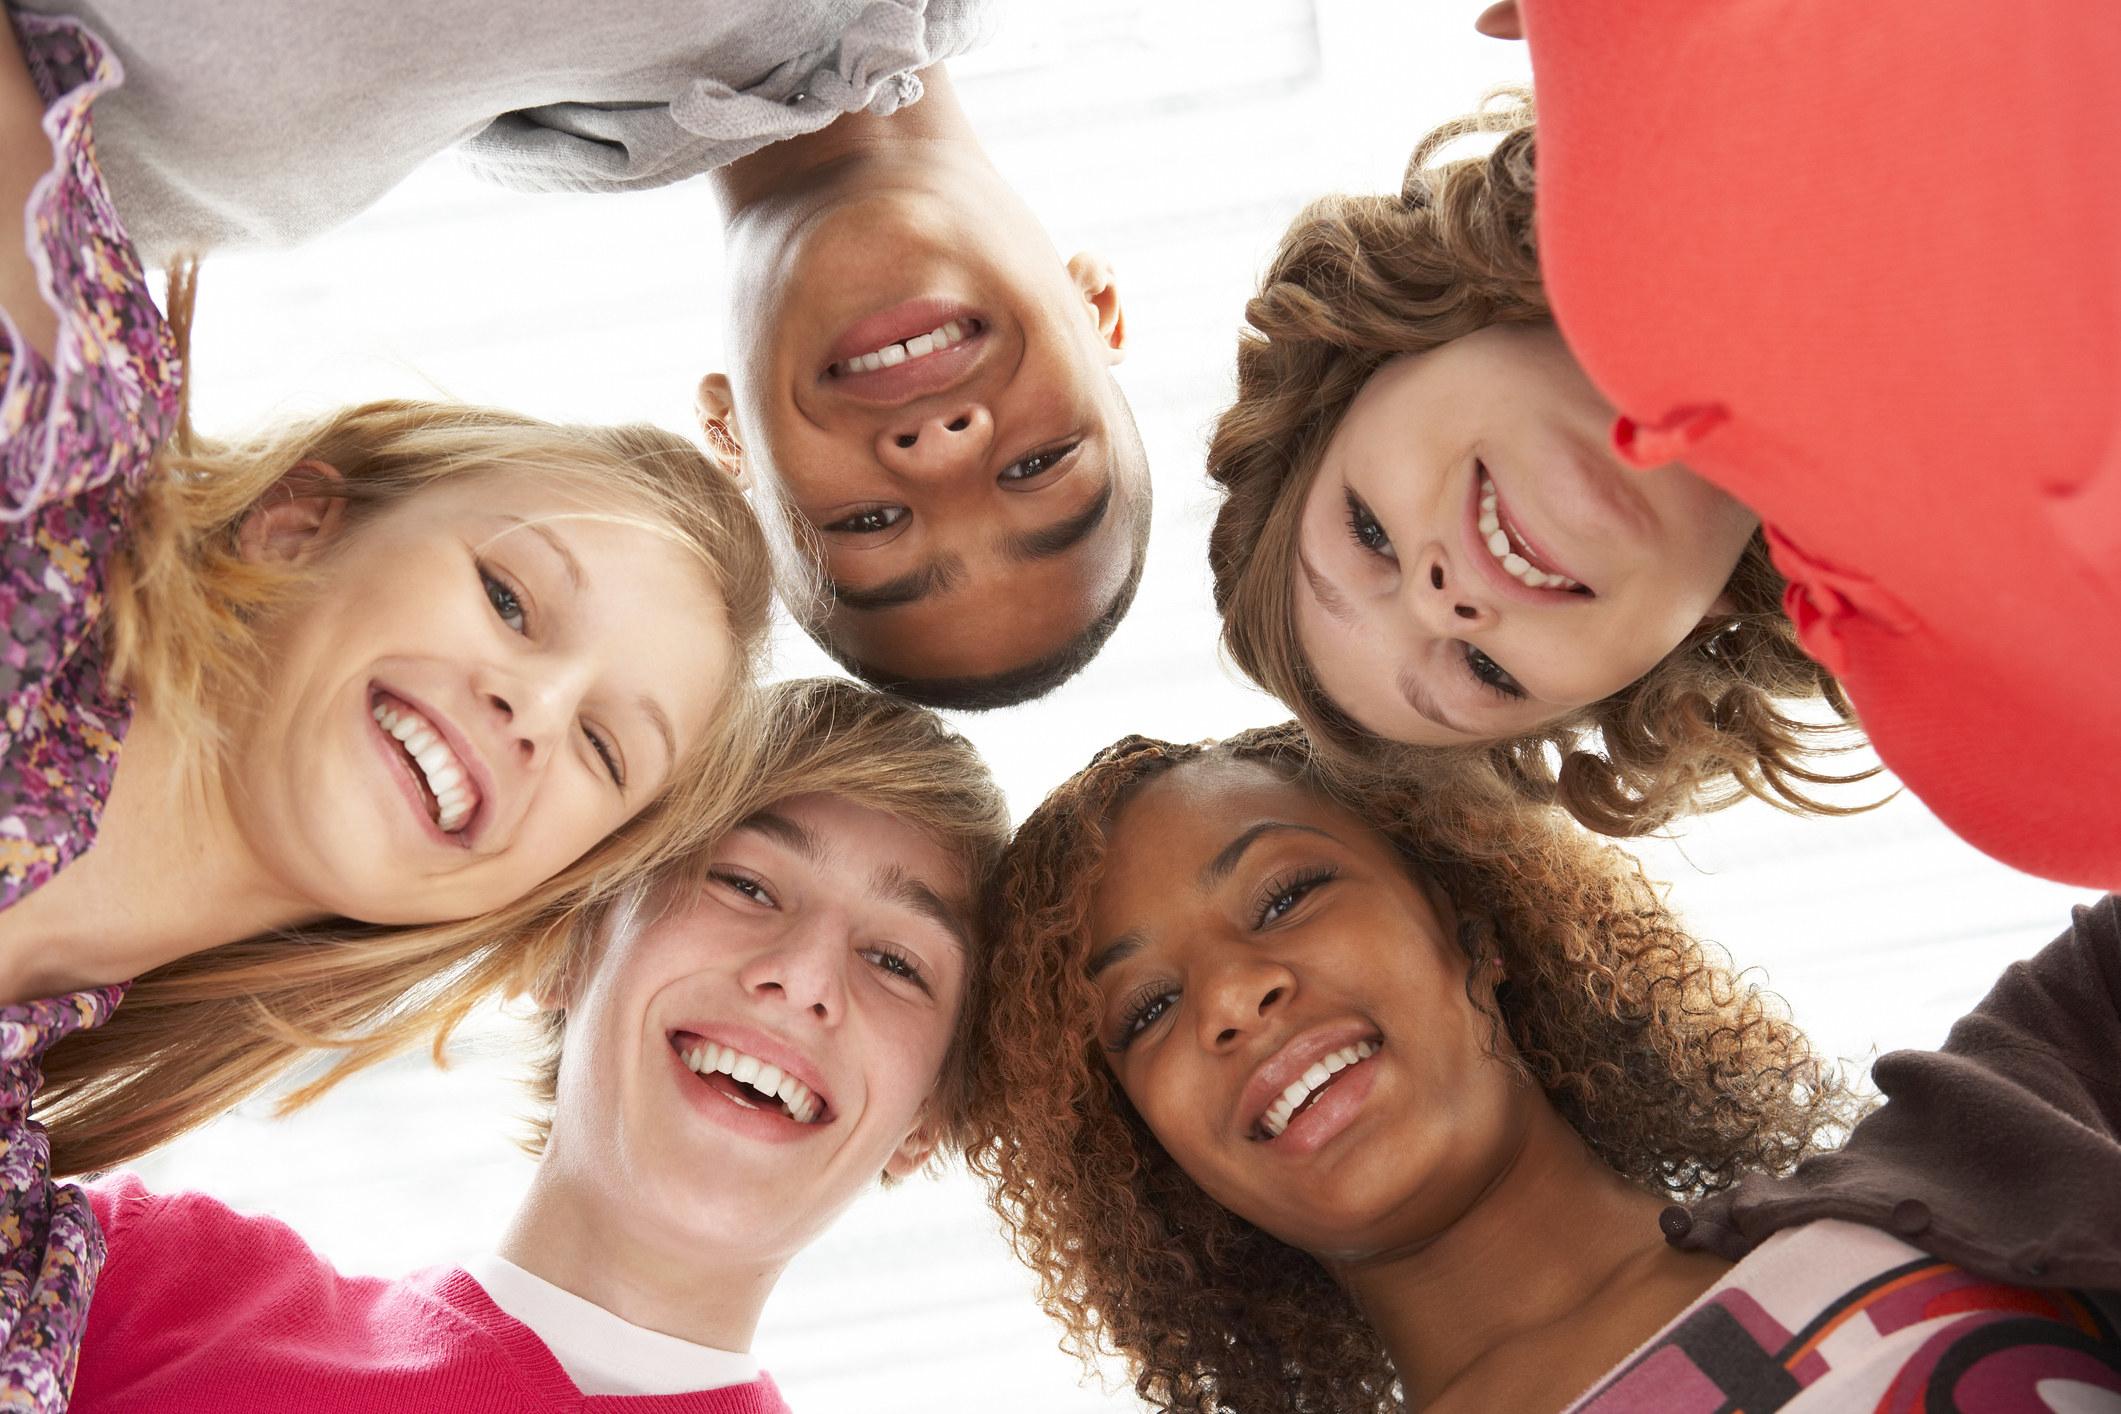 Super generic stock image of teenagers smiling